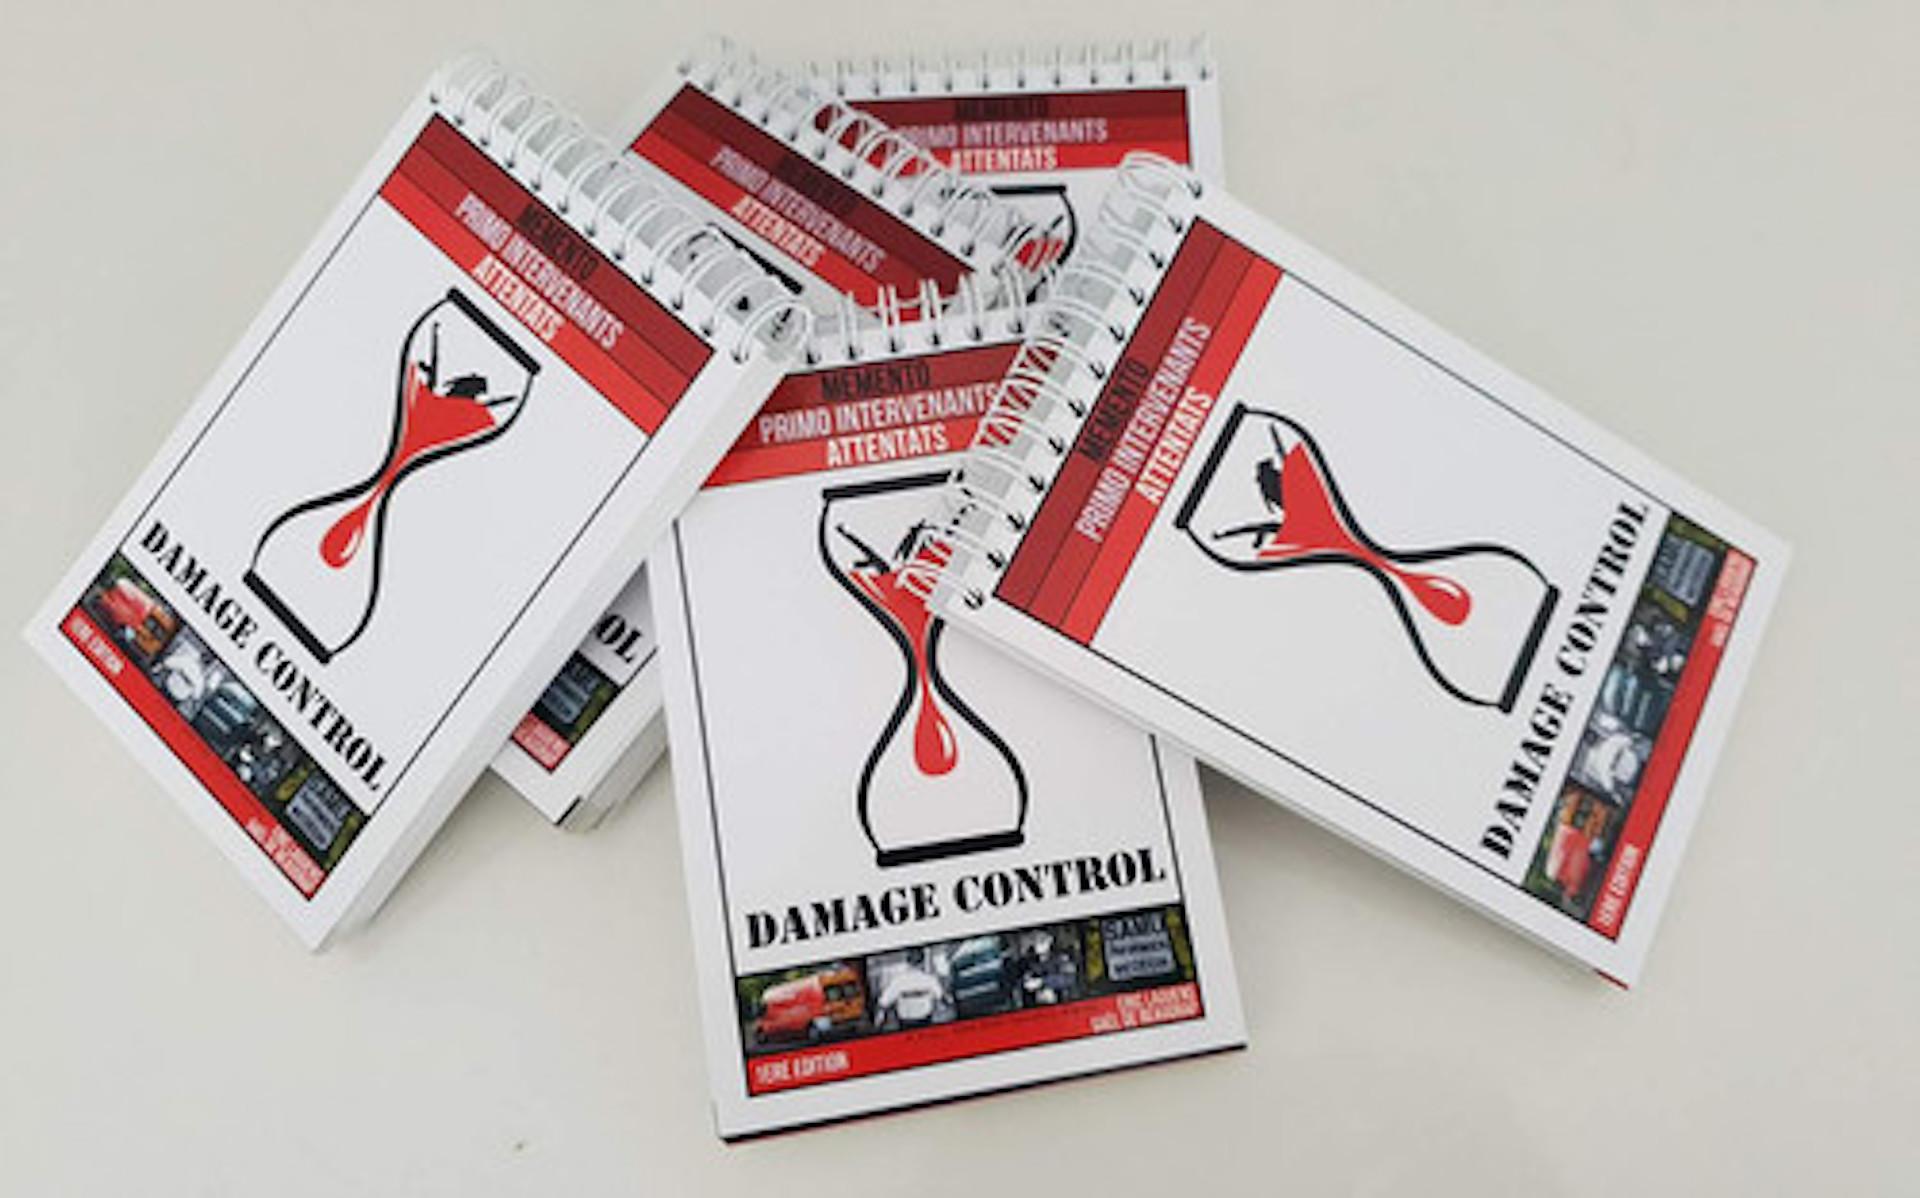 Safe Medic : Memento primo-intervenants attentats damage control